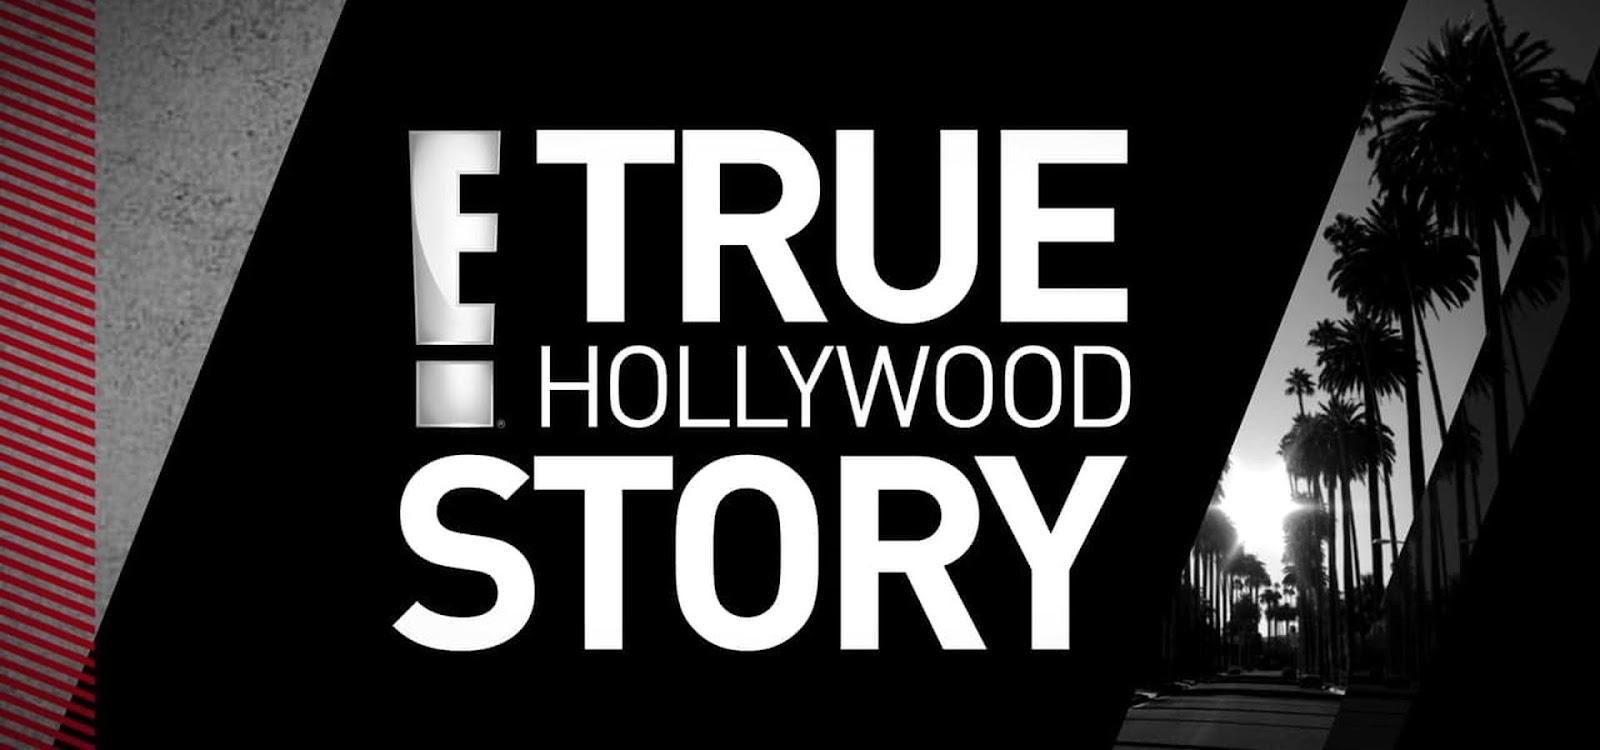 ../e-true-hollywood-story.jpeg